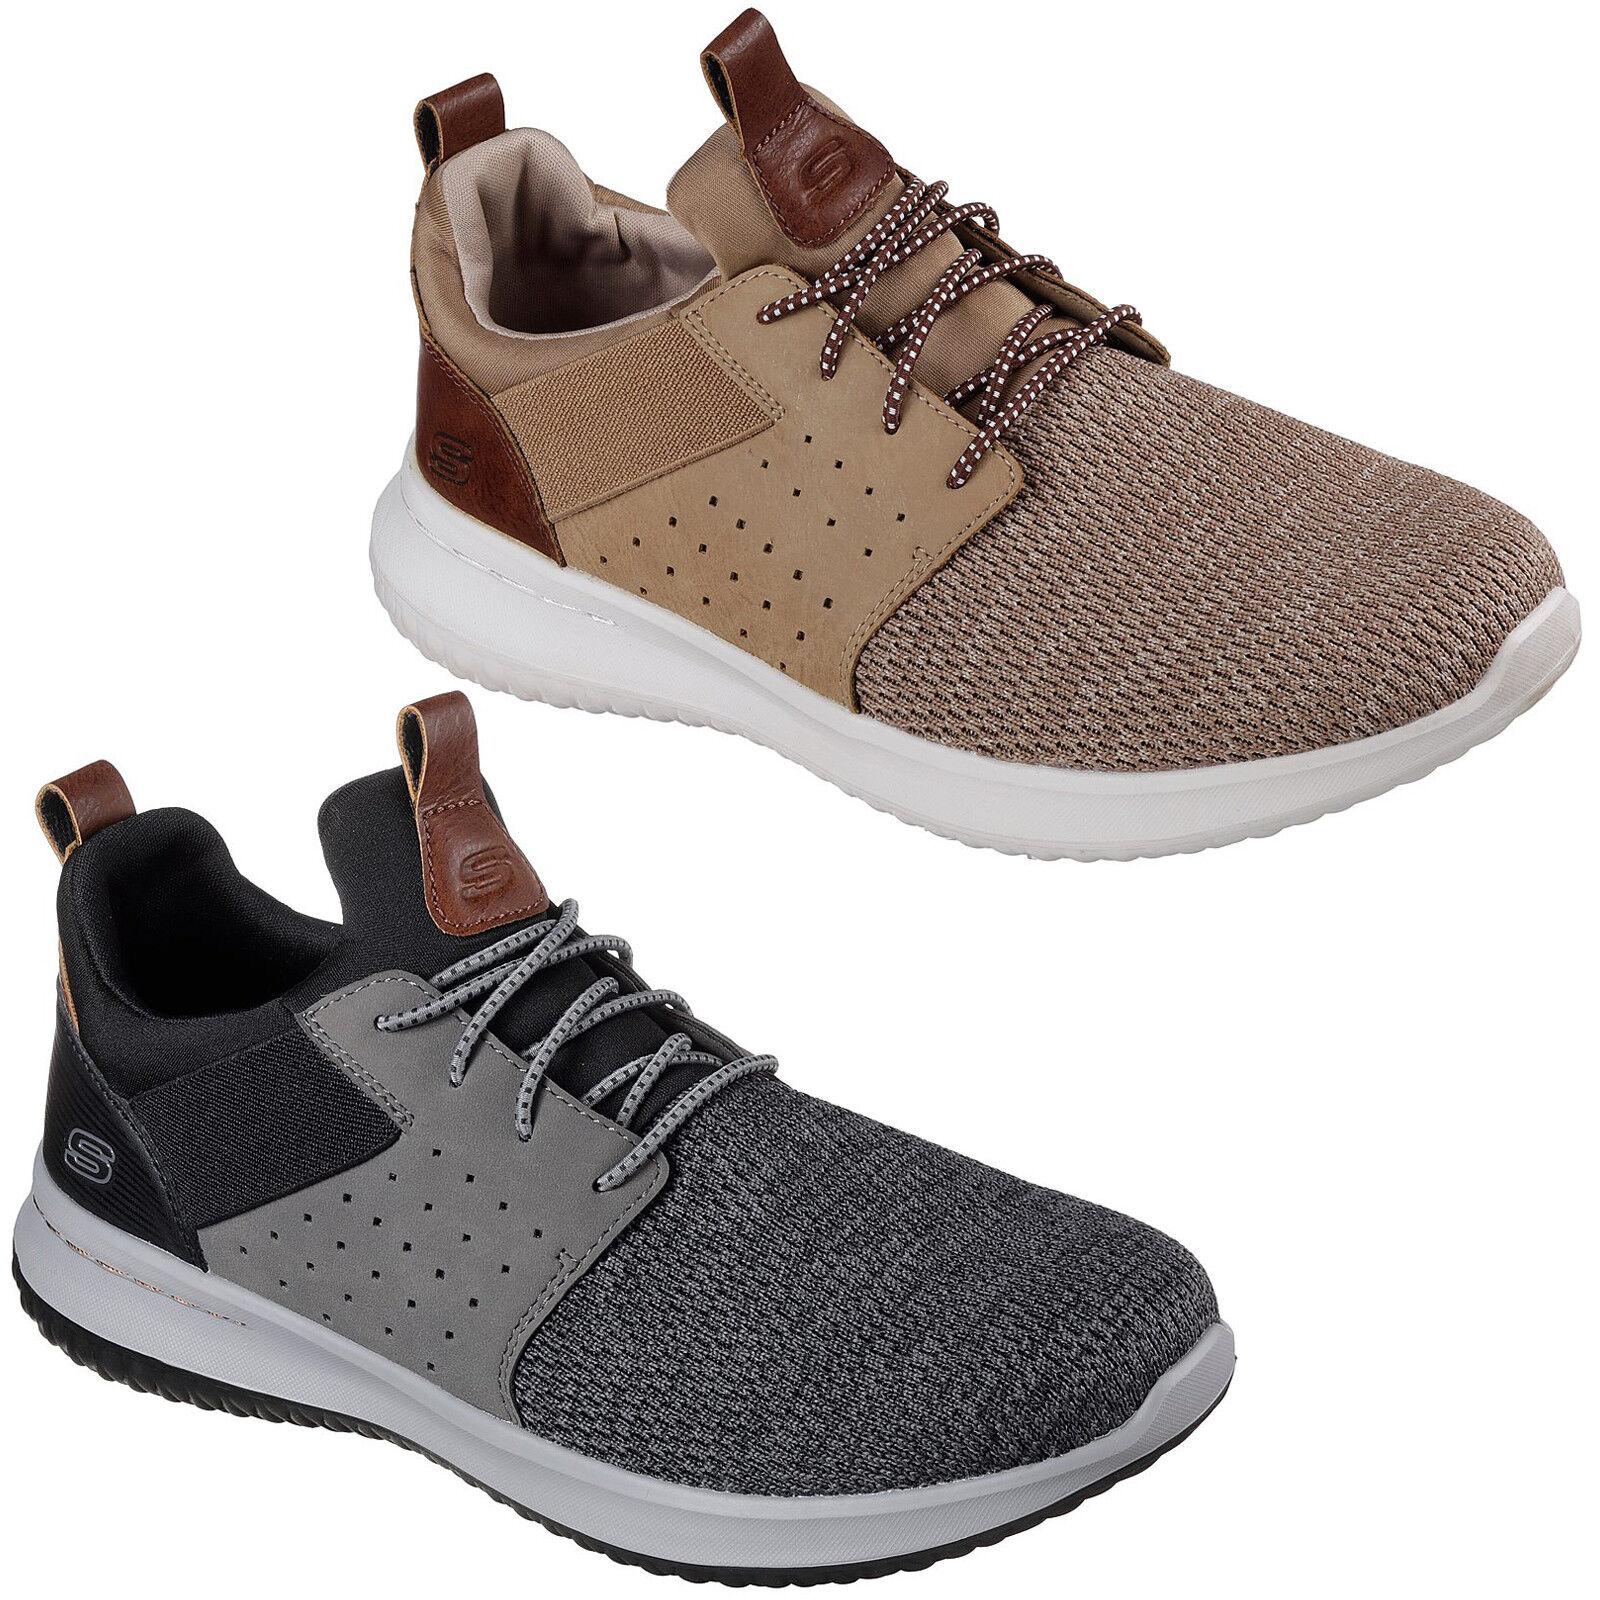 Skechers Delson-camben entrenadores deportivos Malla de punto ligero Zapatos para hombre 65474